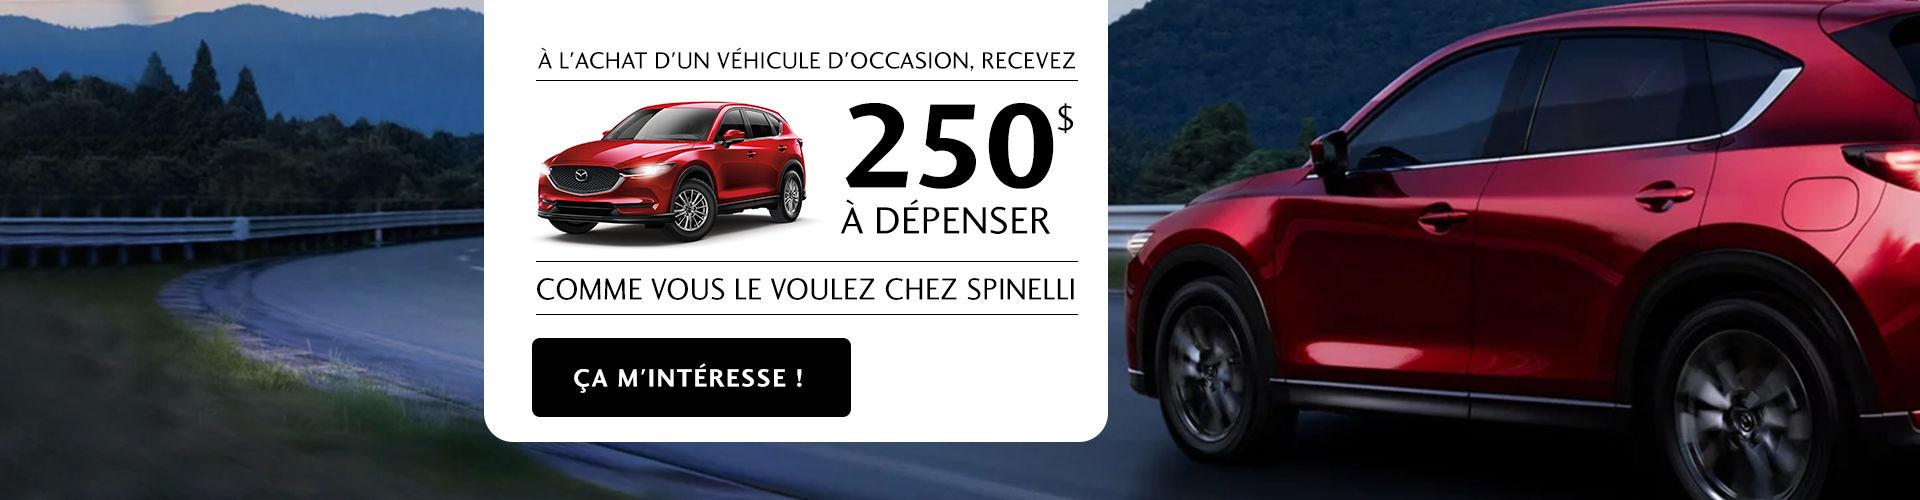 Rabais 250 occasion Mazda